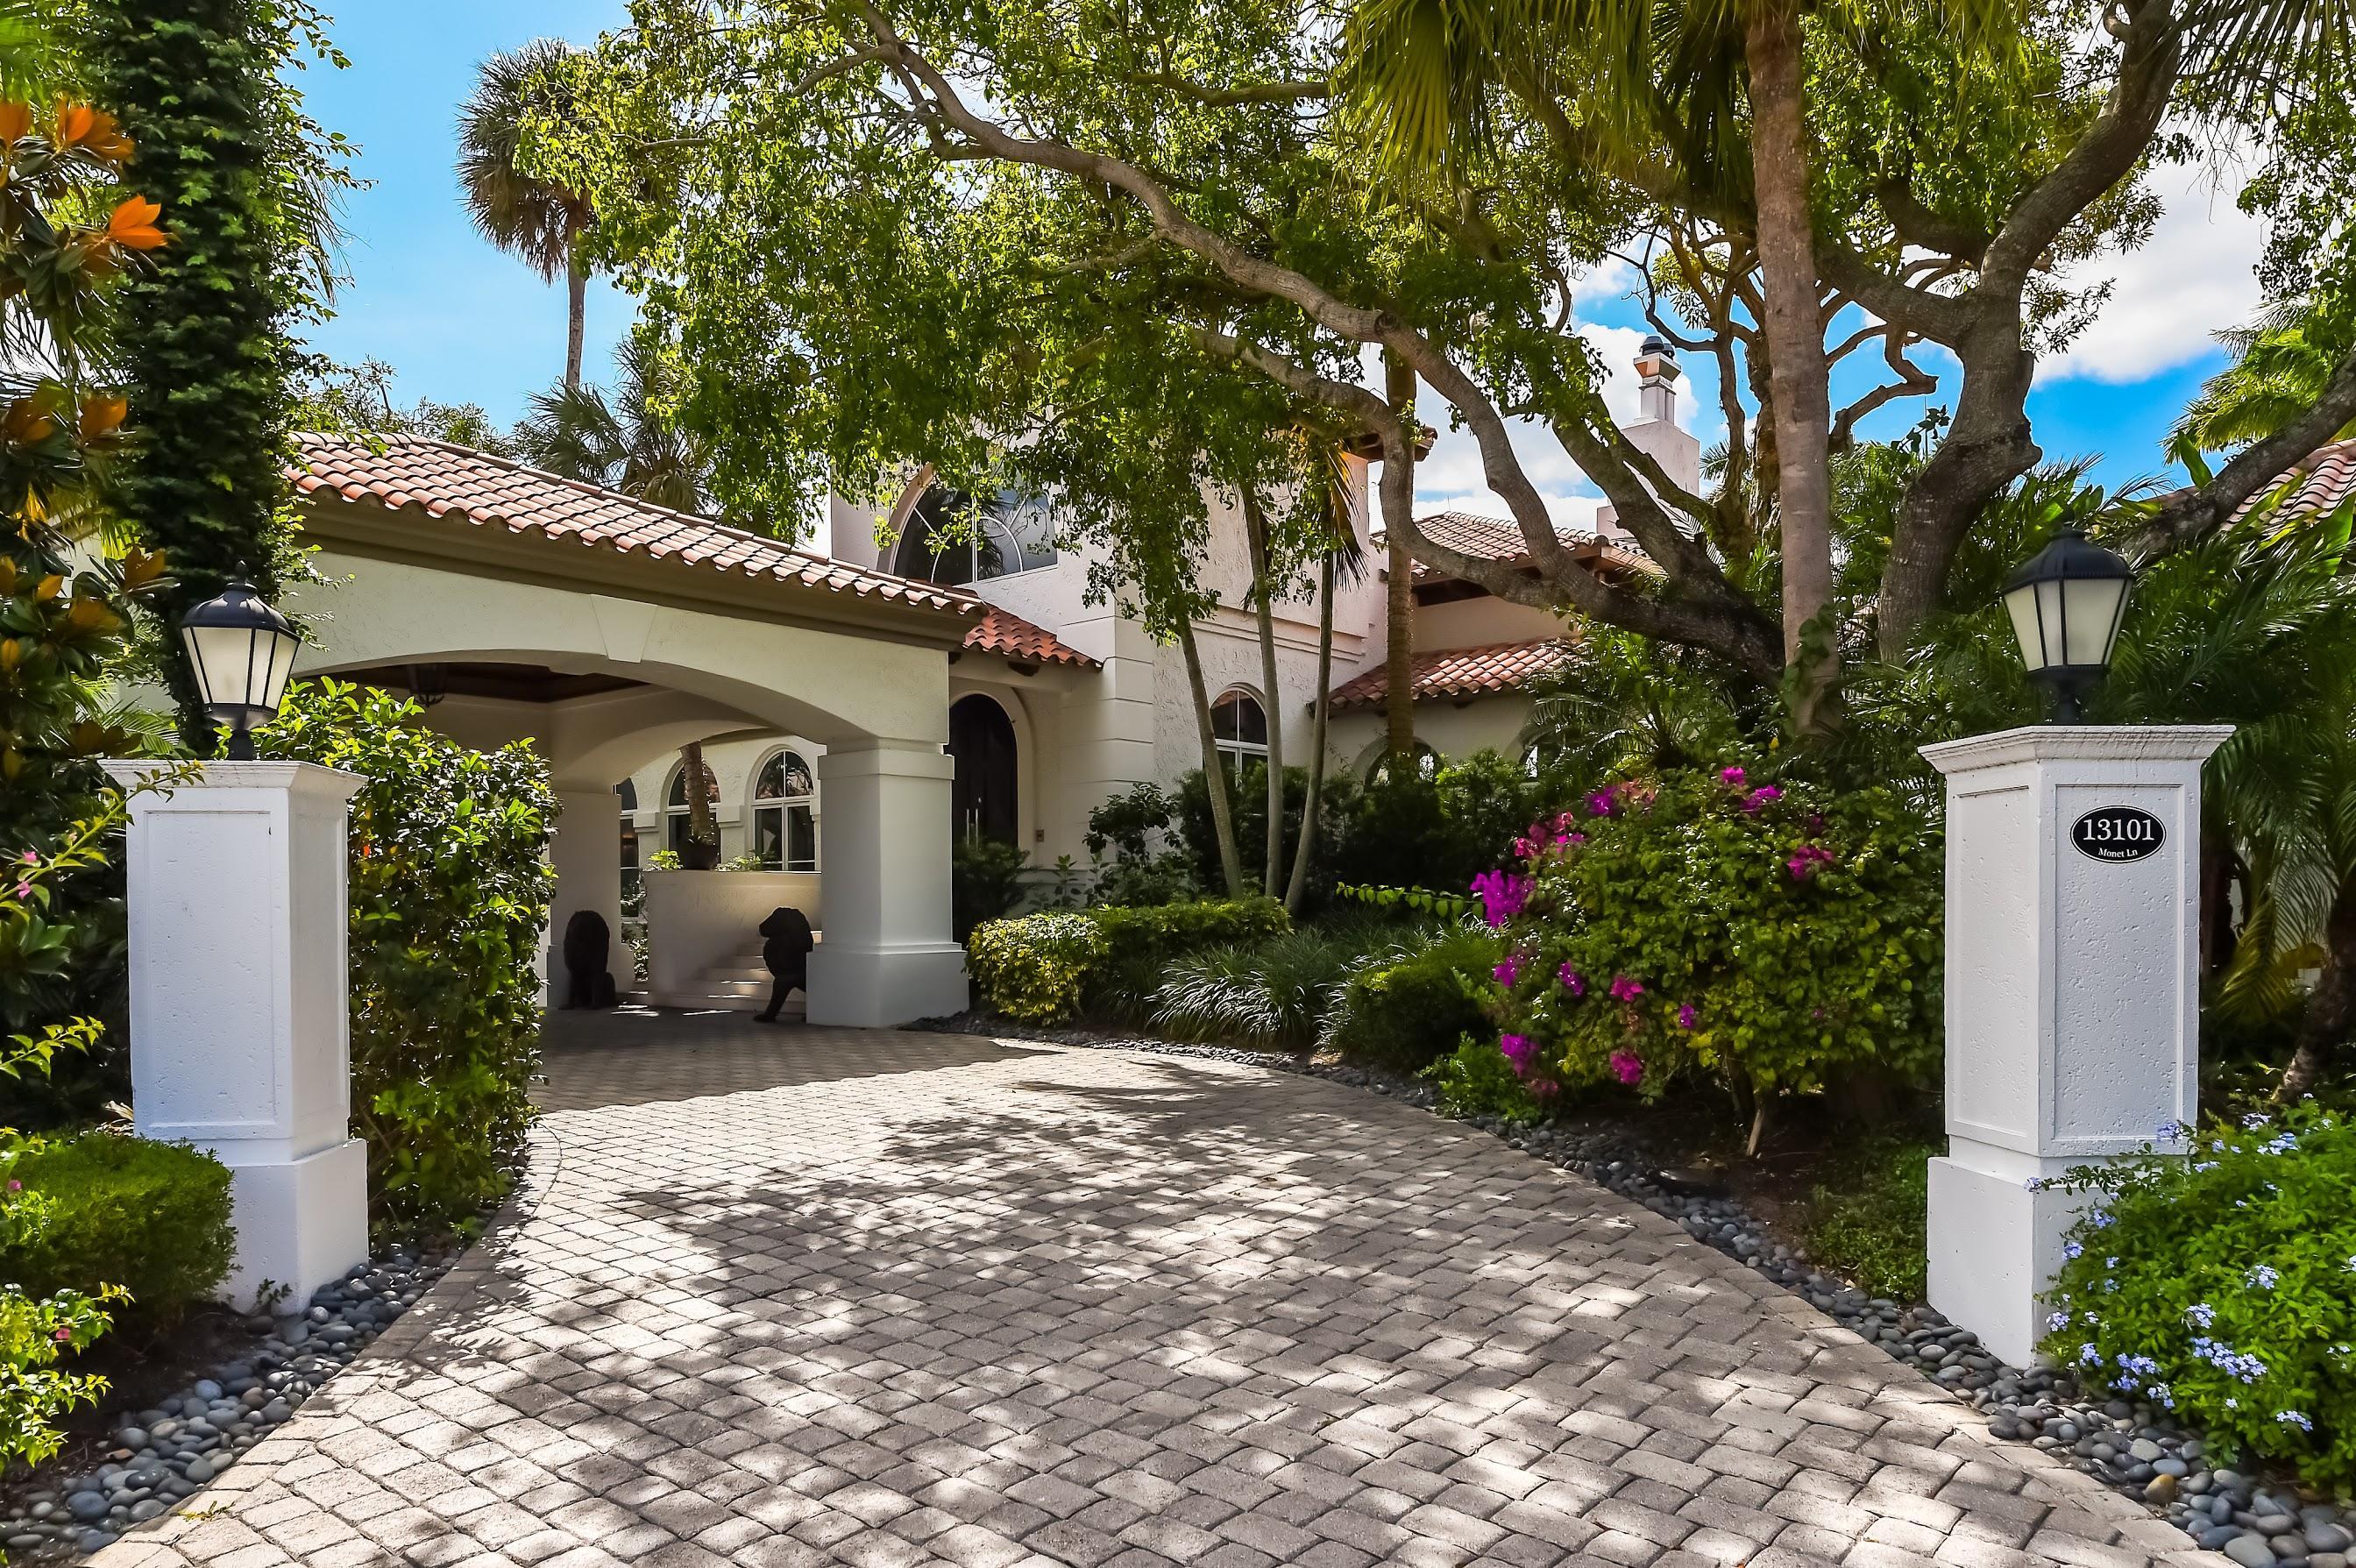 13101 Monet Palm Beach Gardens FL 33410